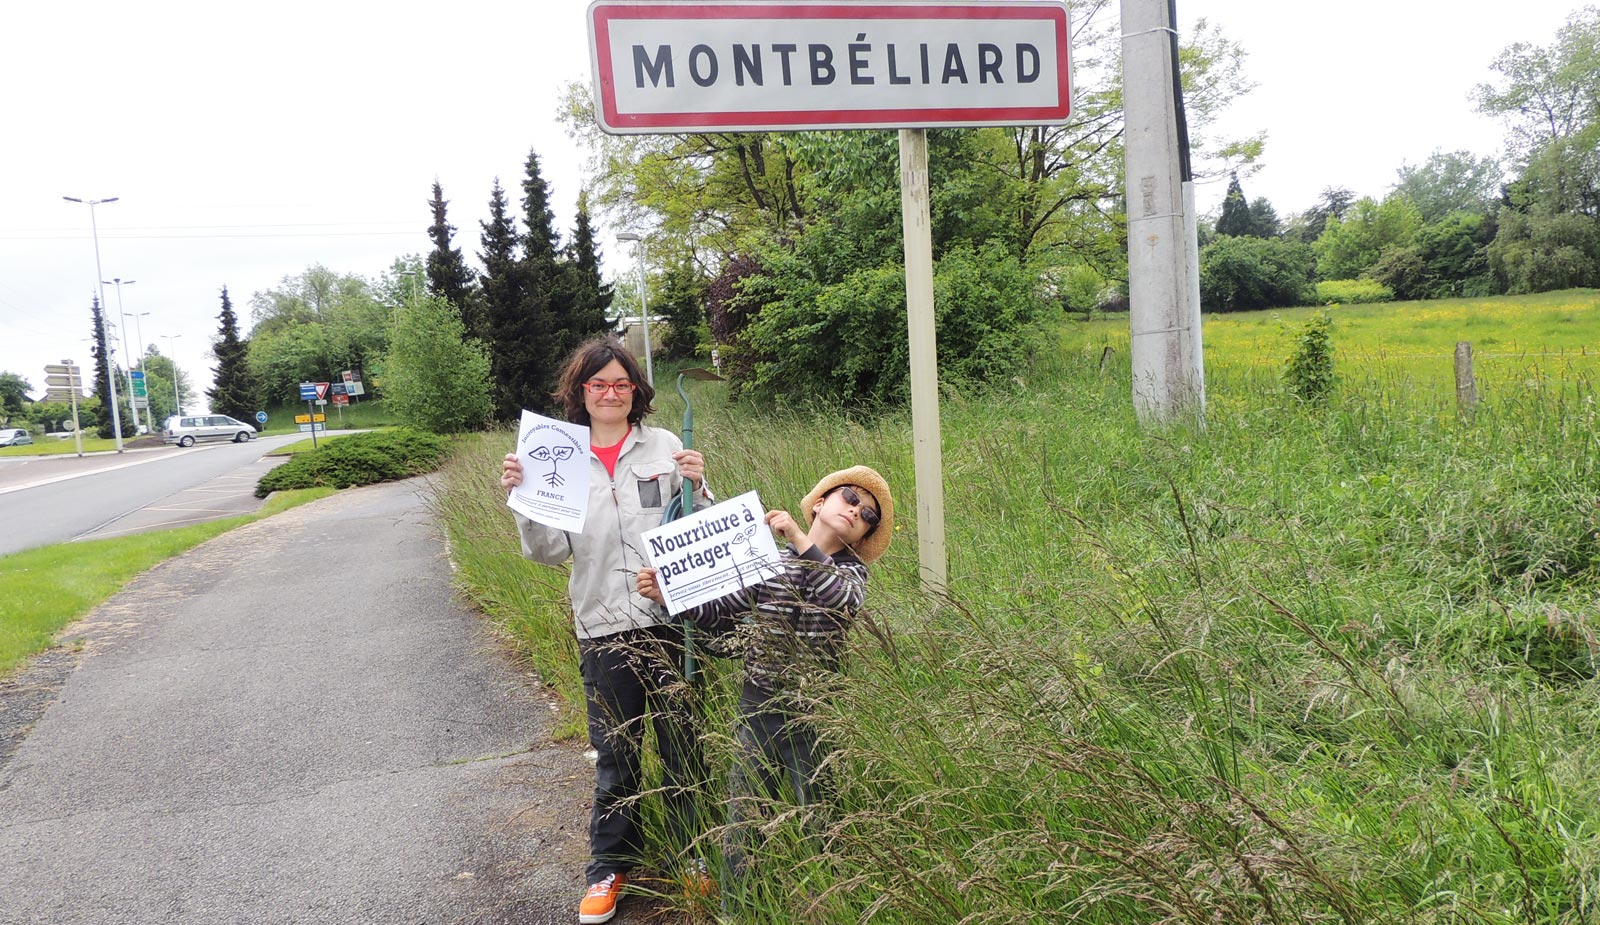 Montbeliard_Incroyables-Comestibles_Incredible-Edible